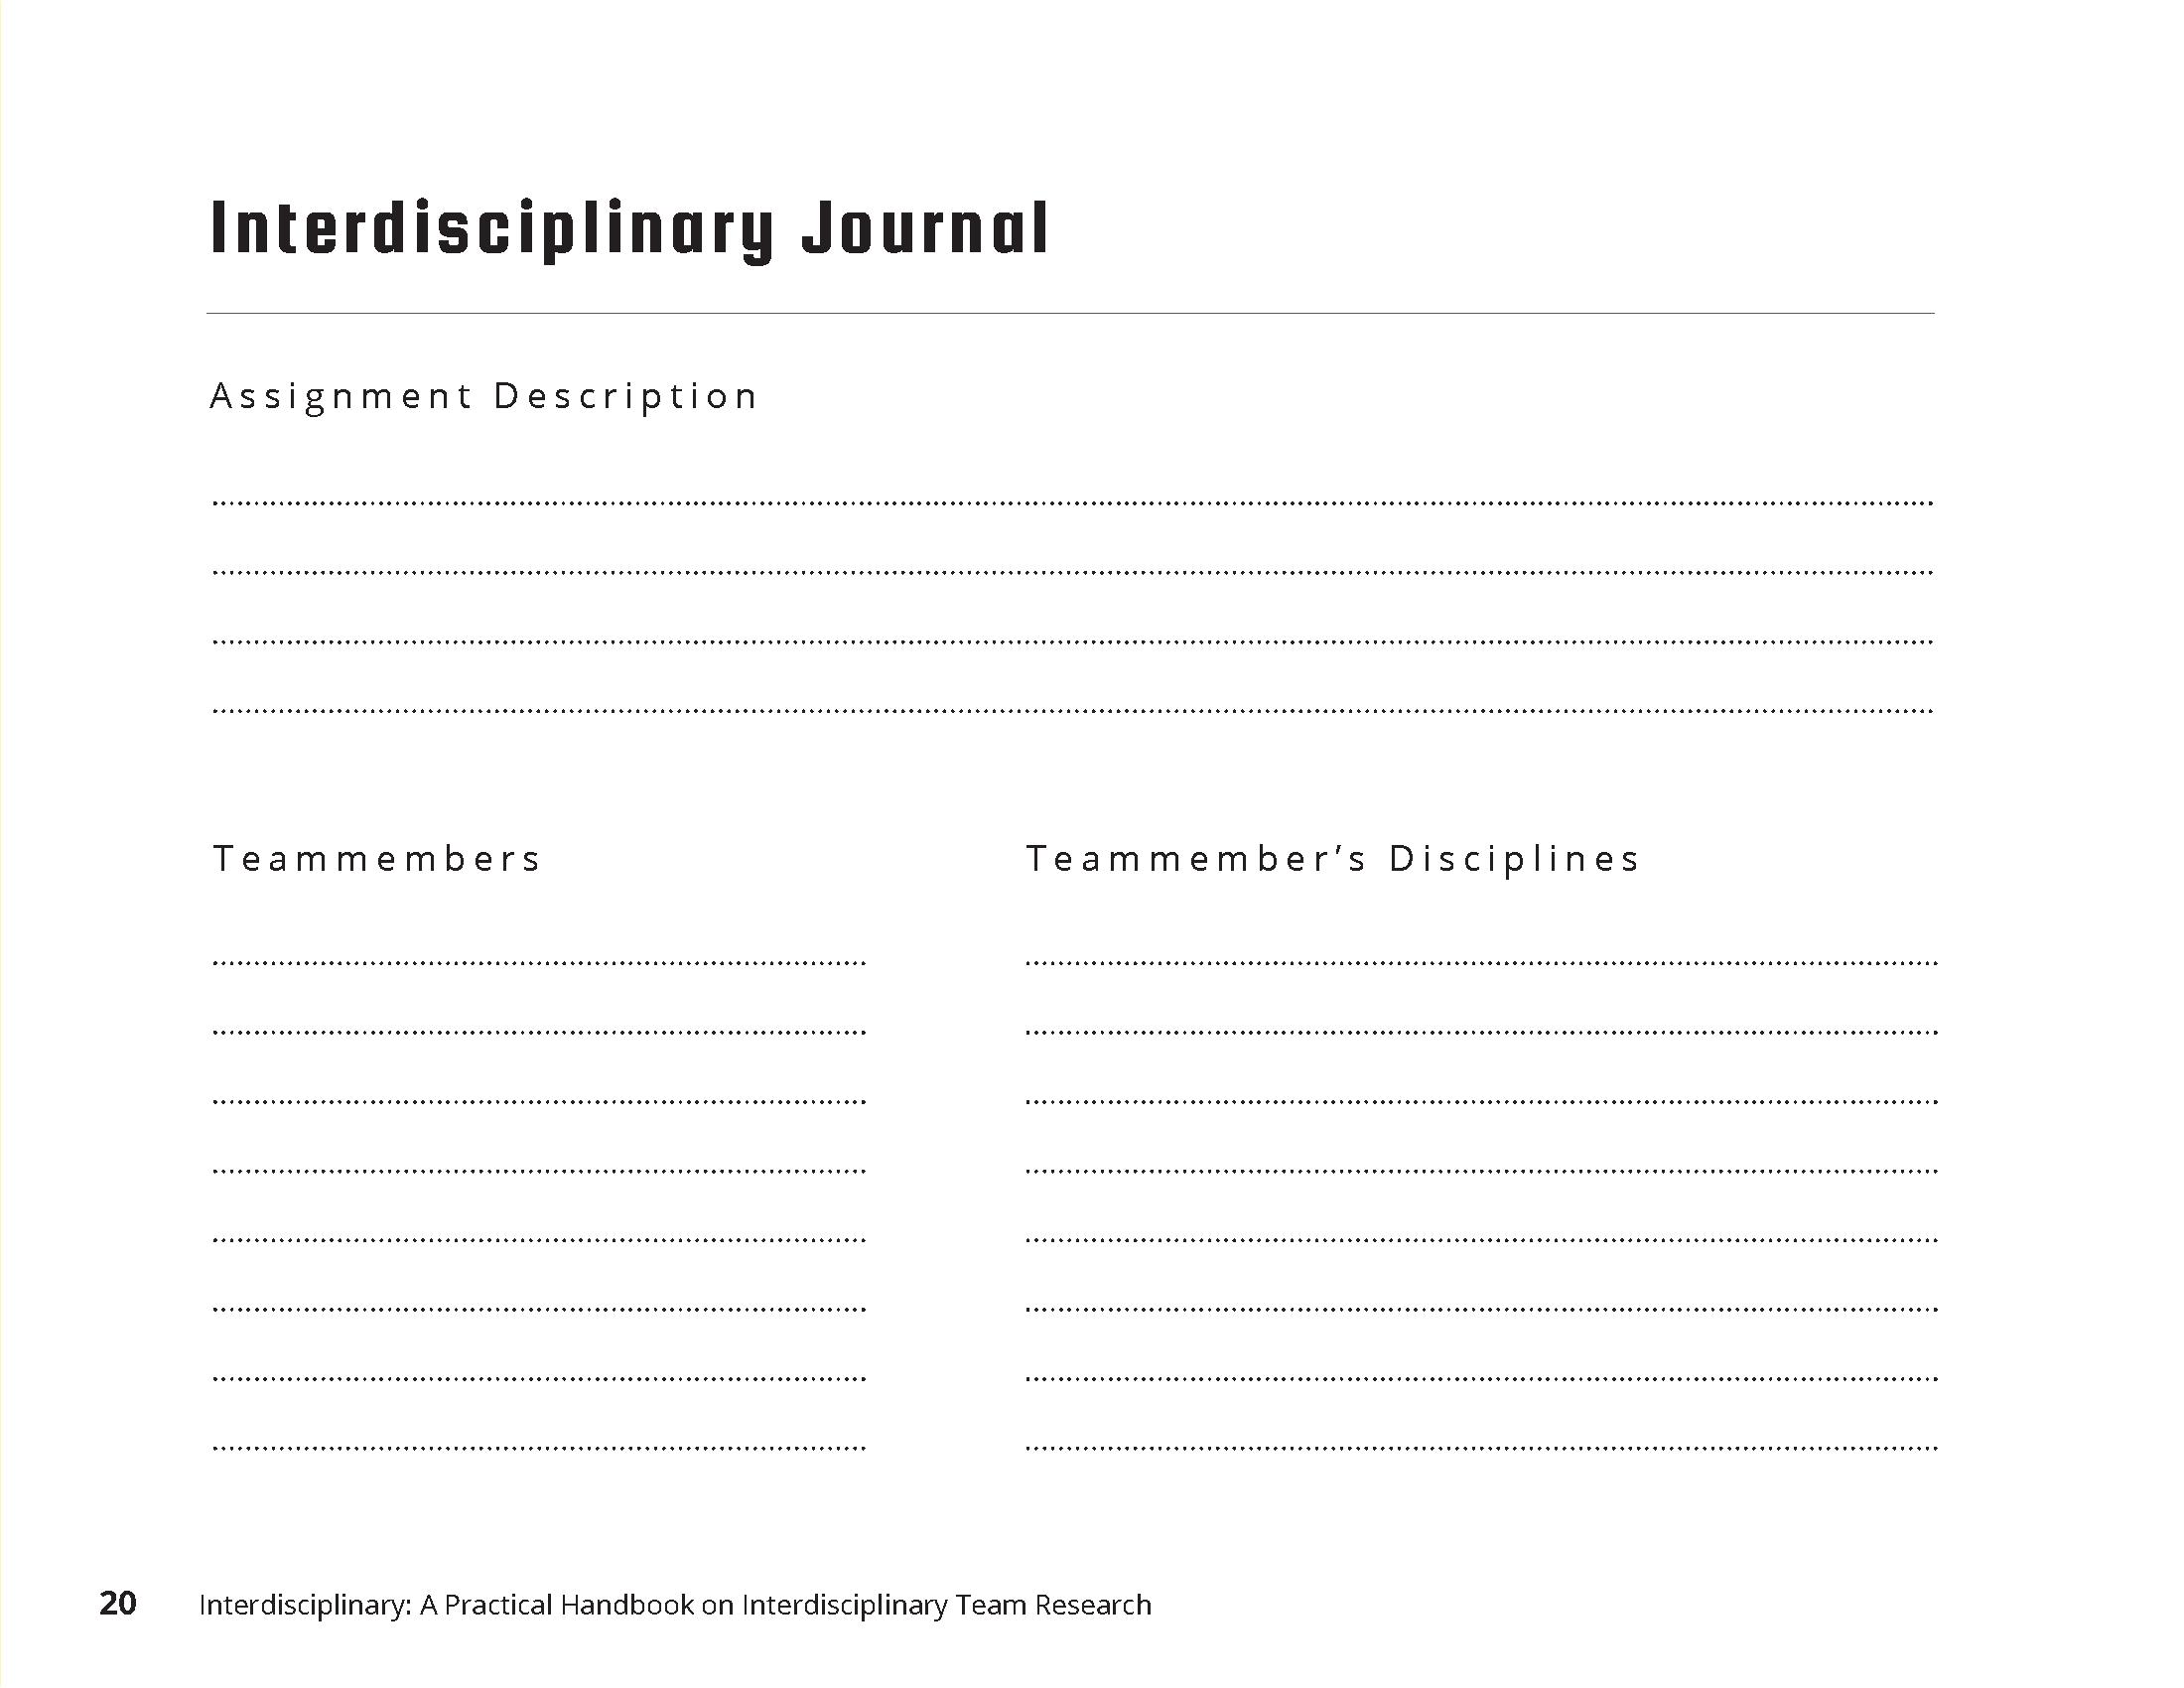 Interdisciplinary Handbook6_Page_21.png